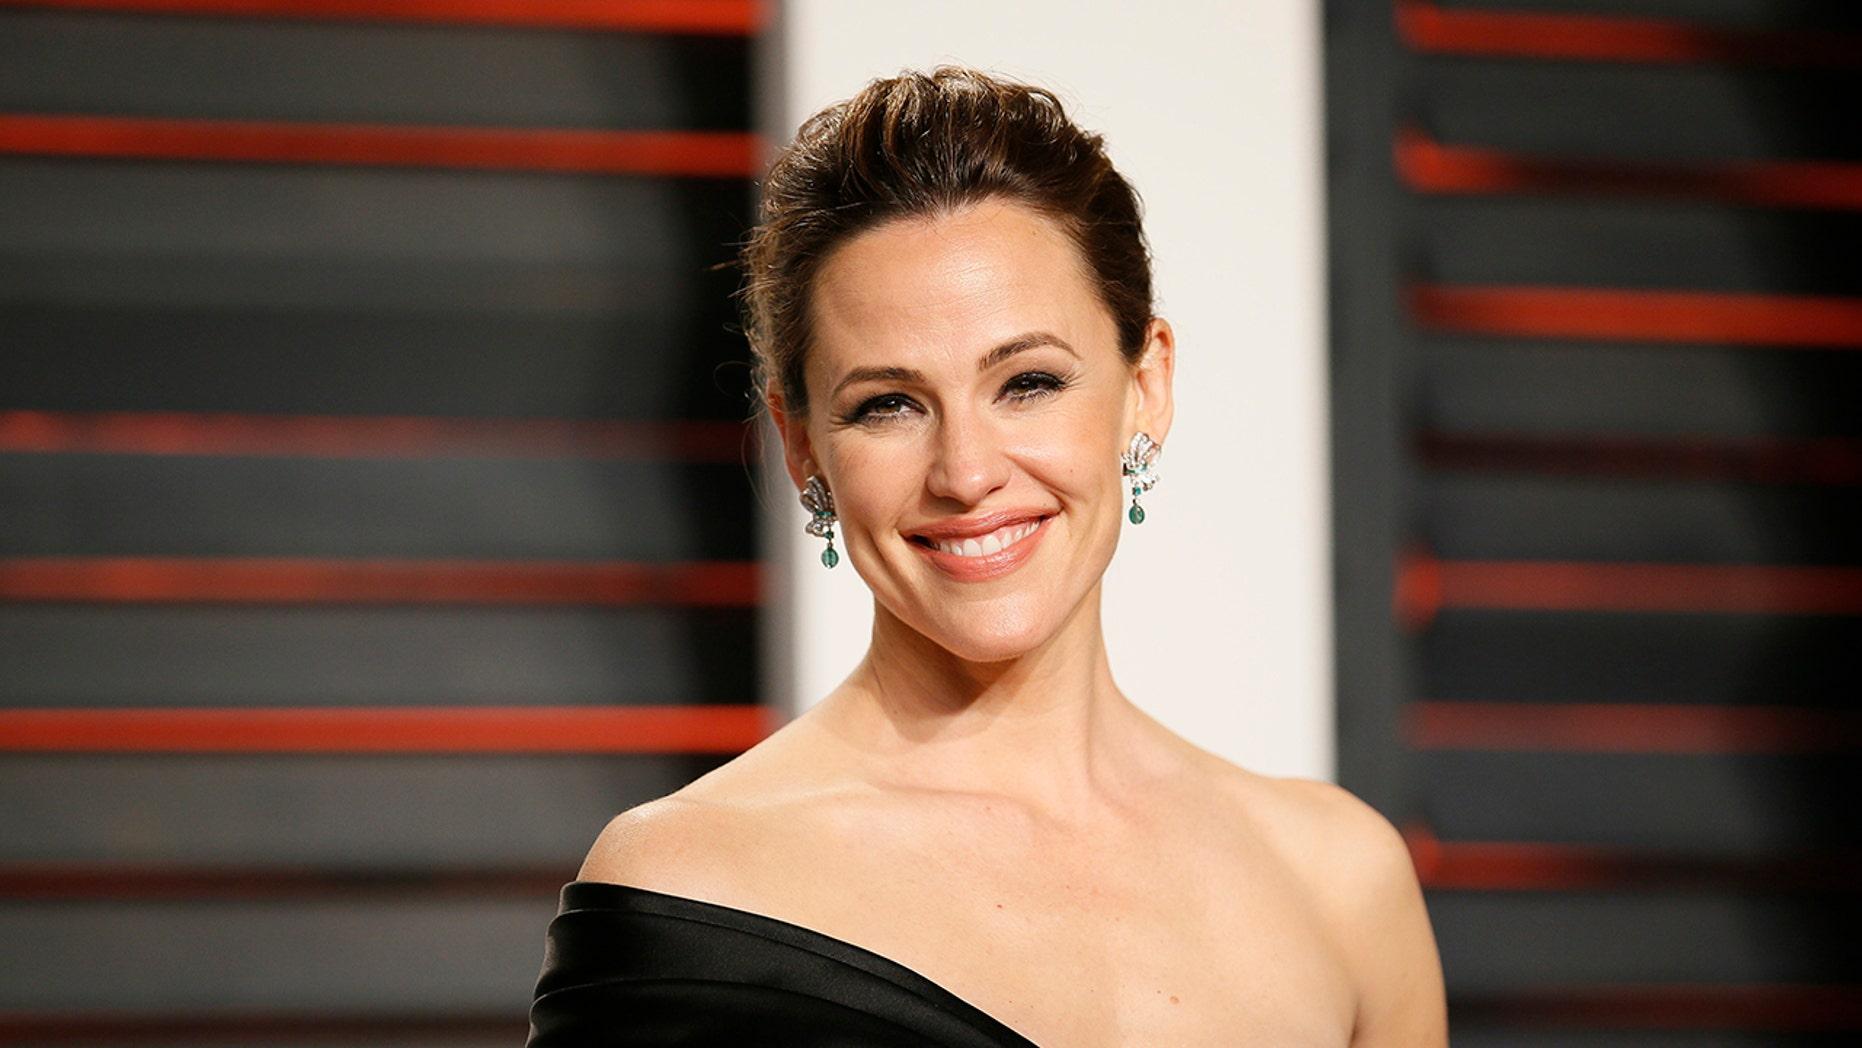 Actress Jennifer Garner arrives at the Vanity Fair Oscar Party in Beverly Hills, California February 28, 2016.  REUTERS/Danny Moloshok - TB3EC2T0GR33K